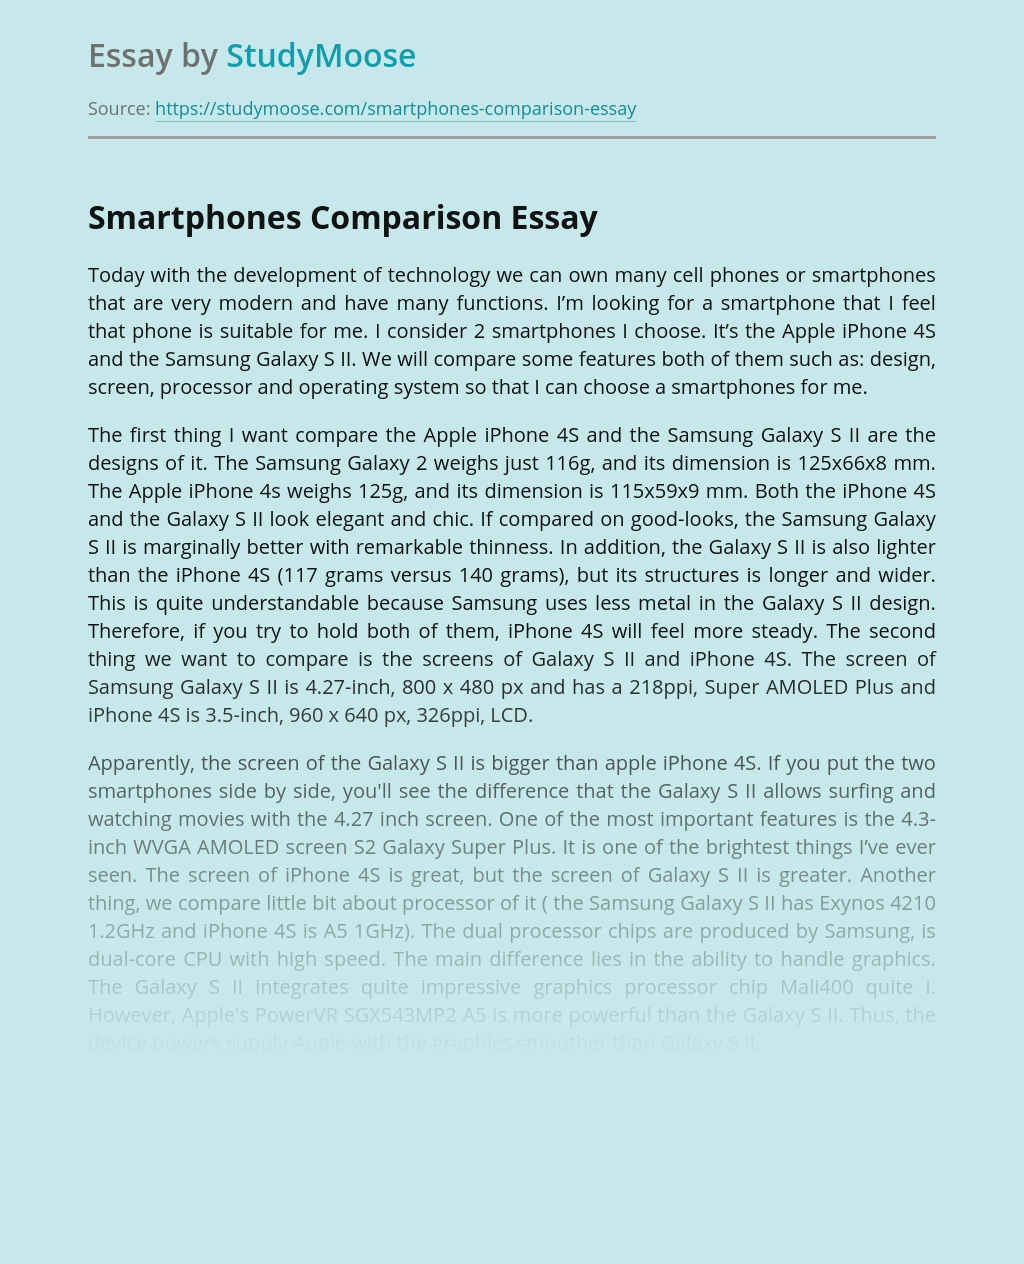 Smartphones Comparison